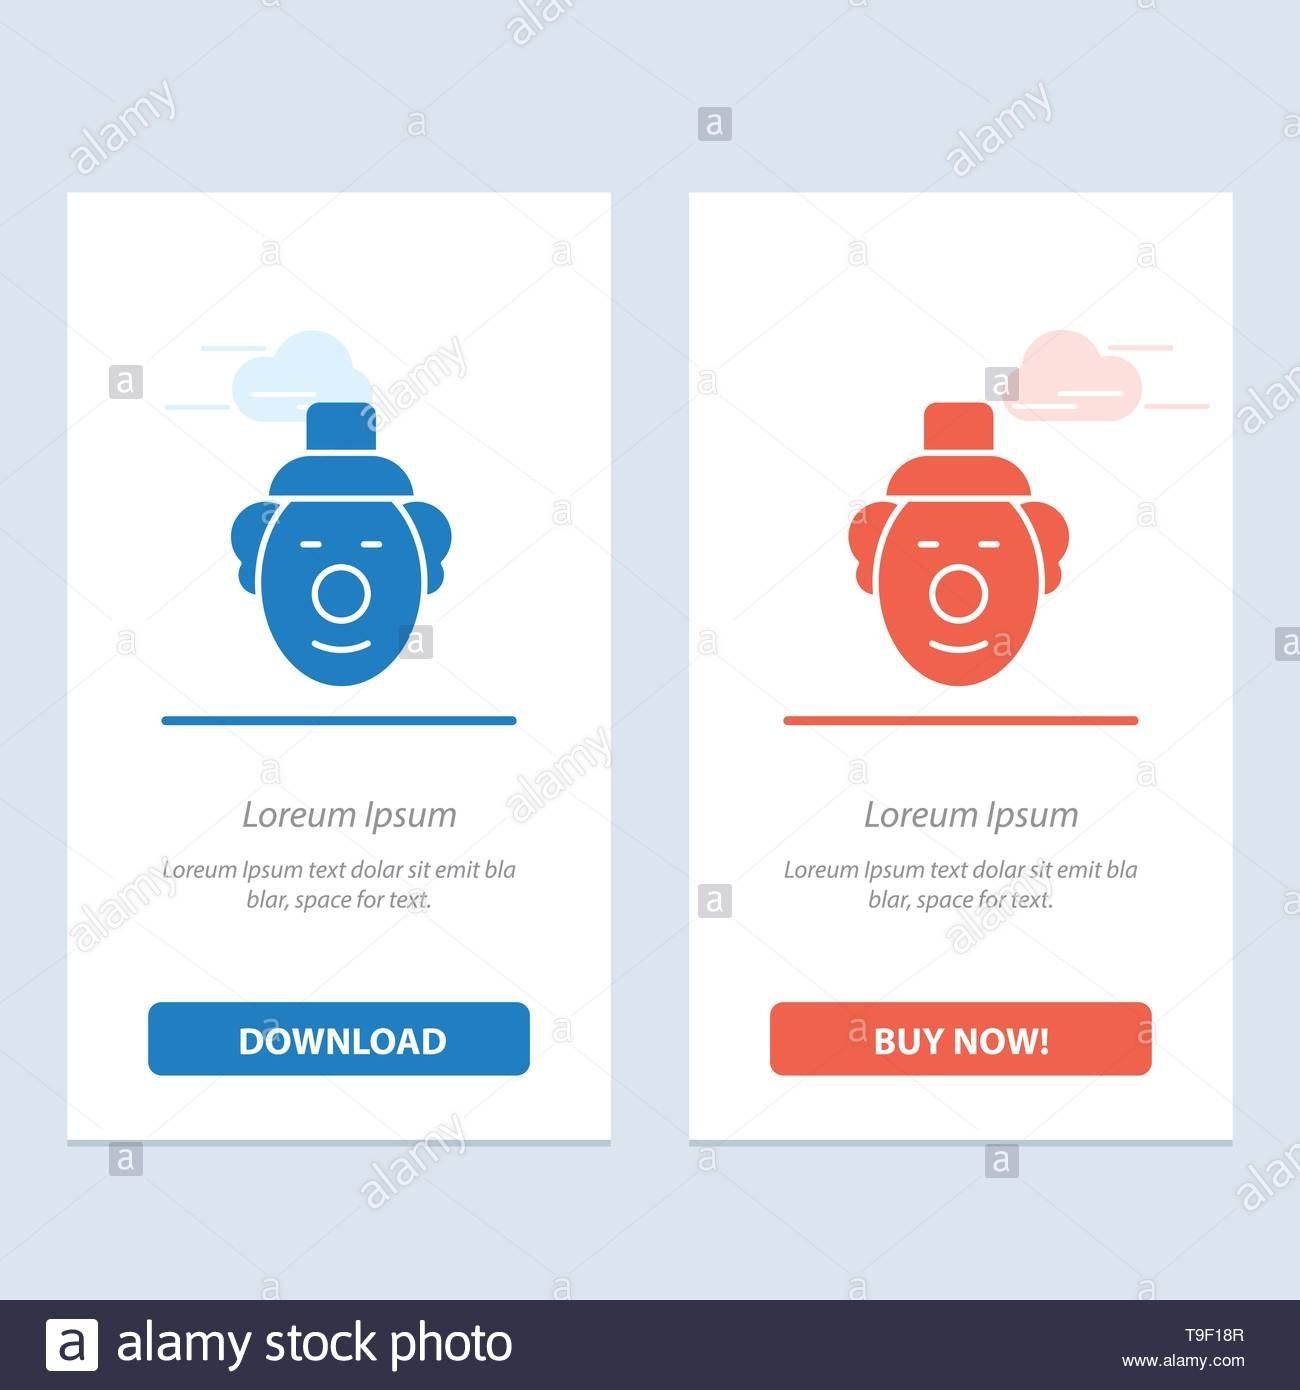 Joker Clown Circus Blue And Red Download And Buy Now Web Widget Regarding Joker Card Template